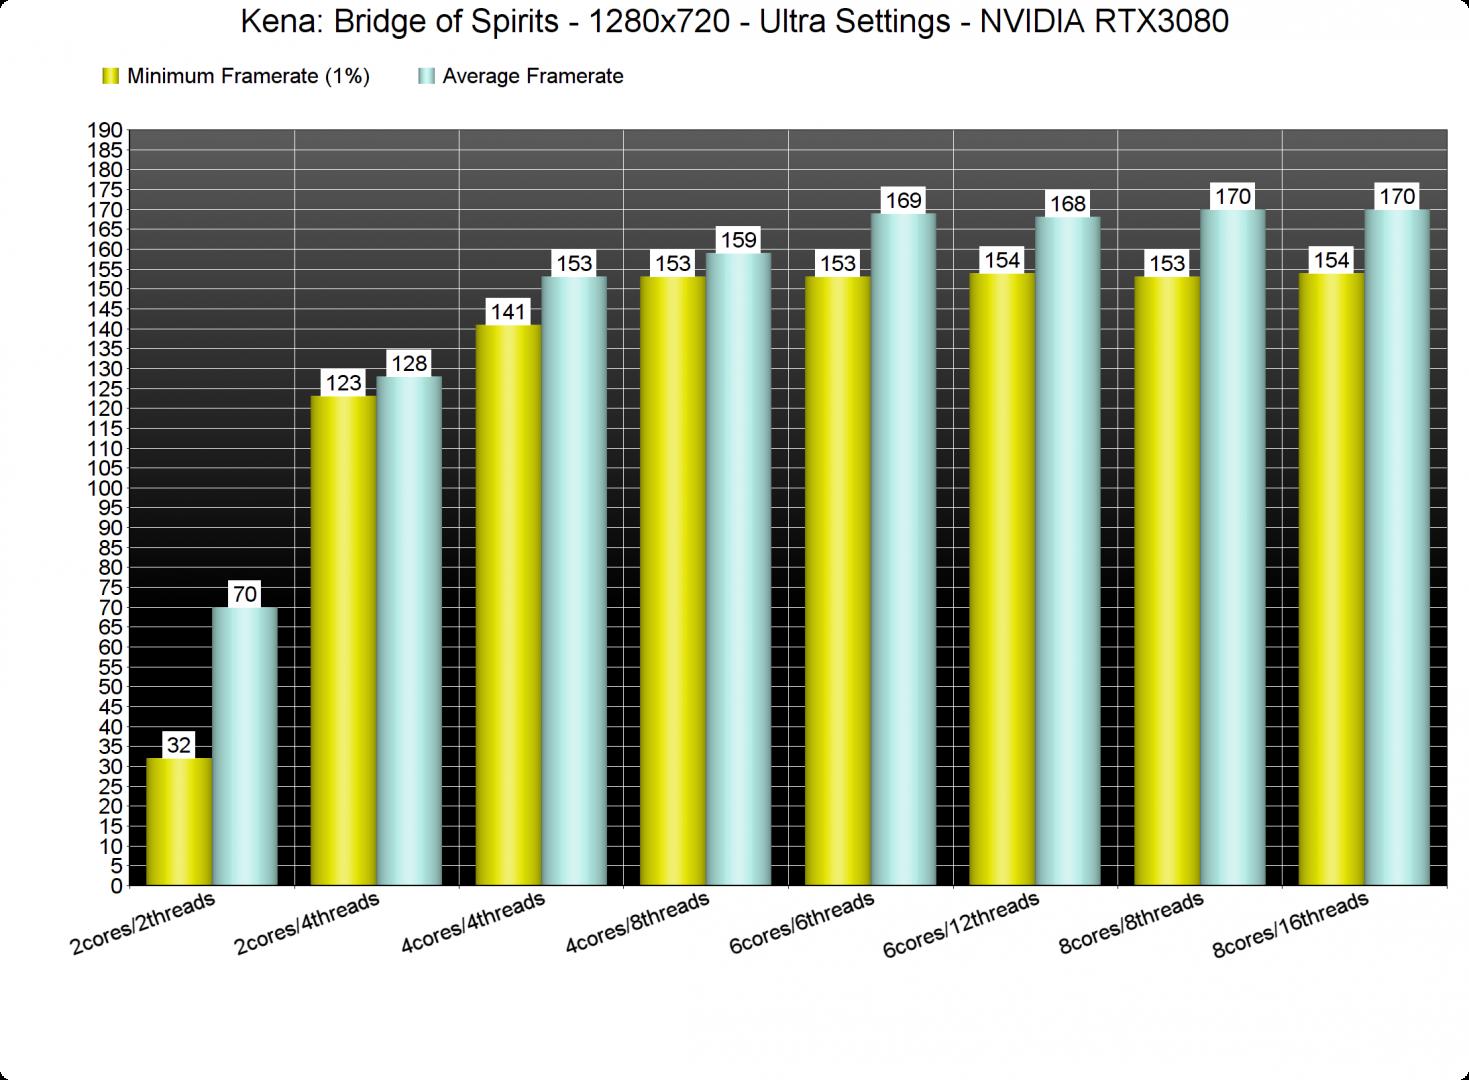 Kena Bridge of Spirits processor benchmarks